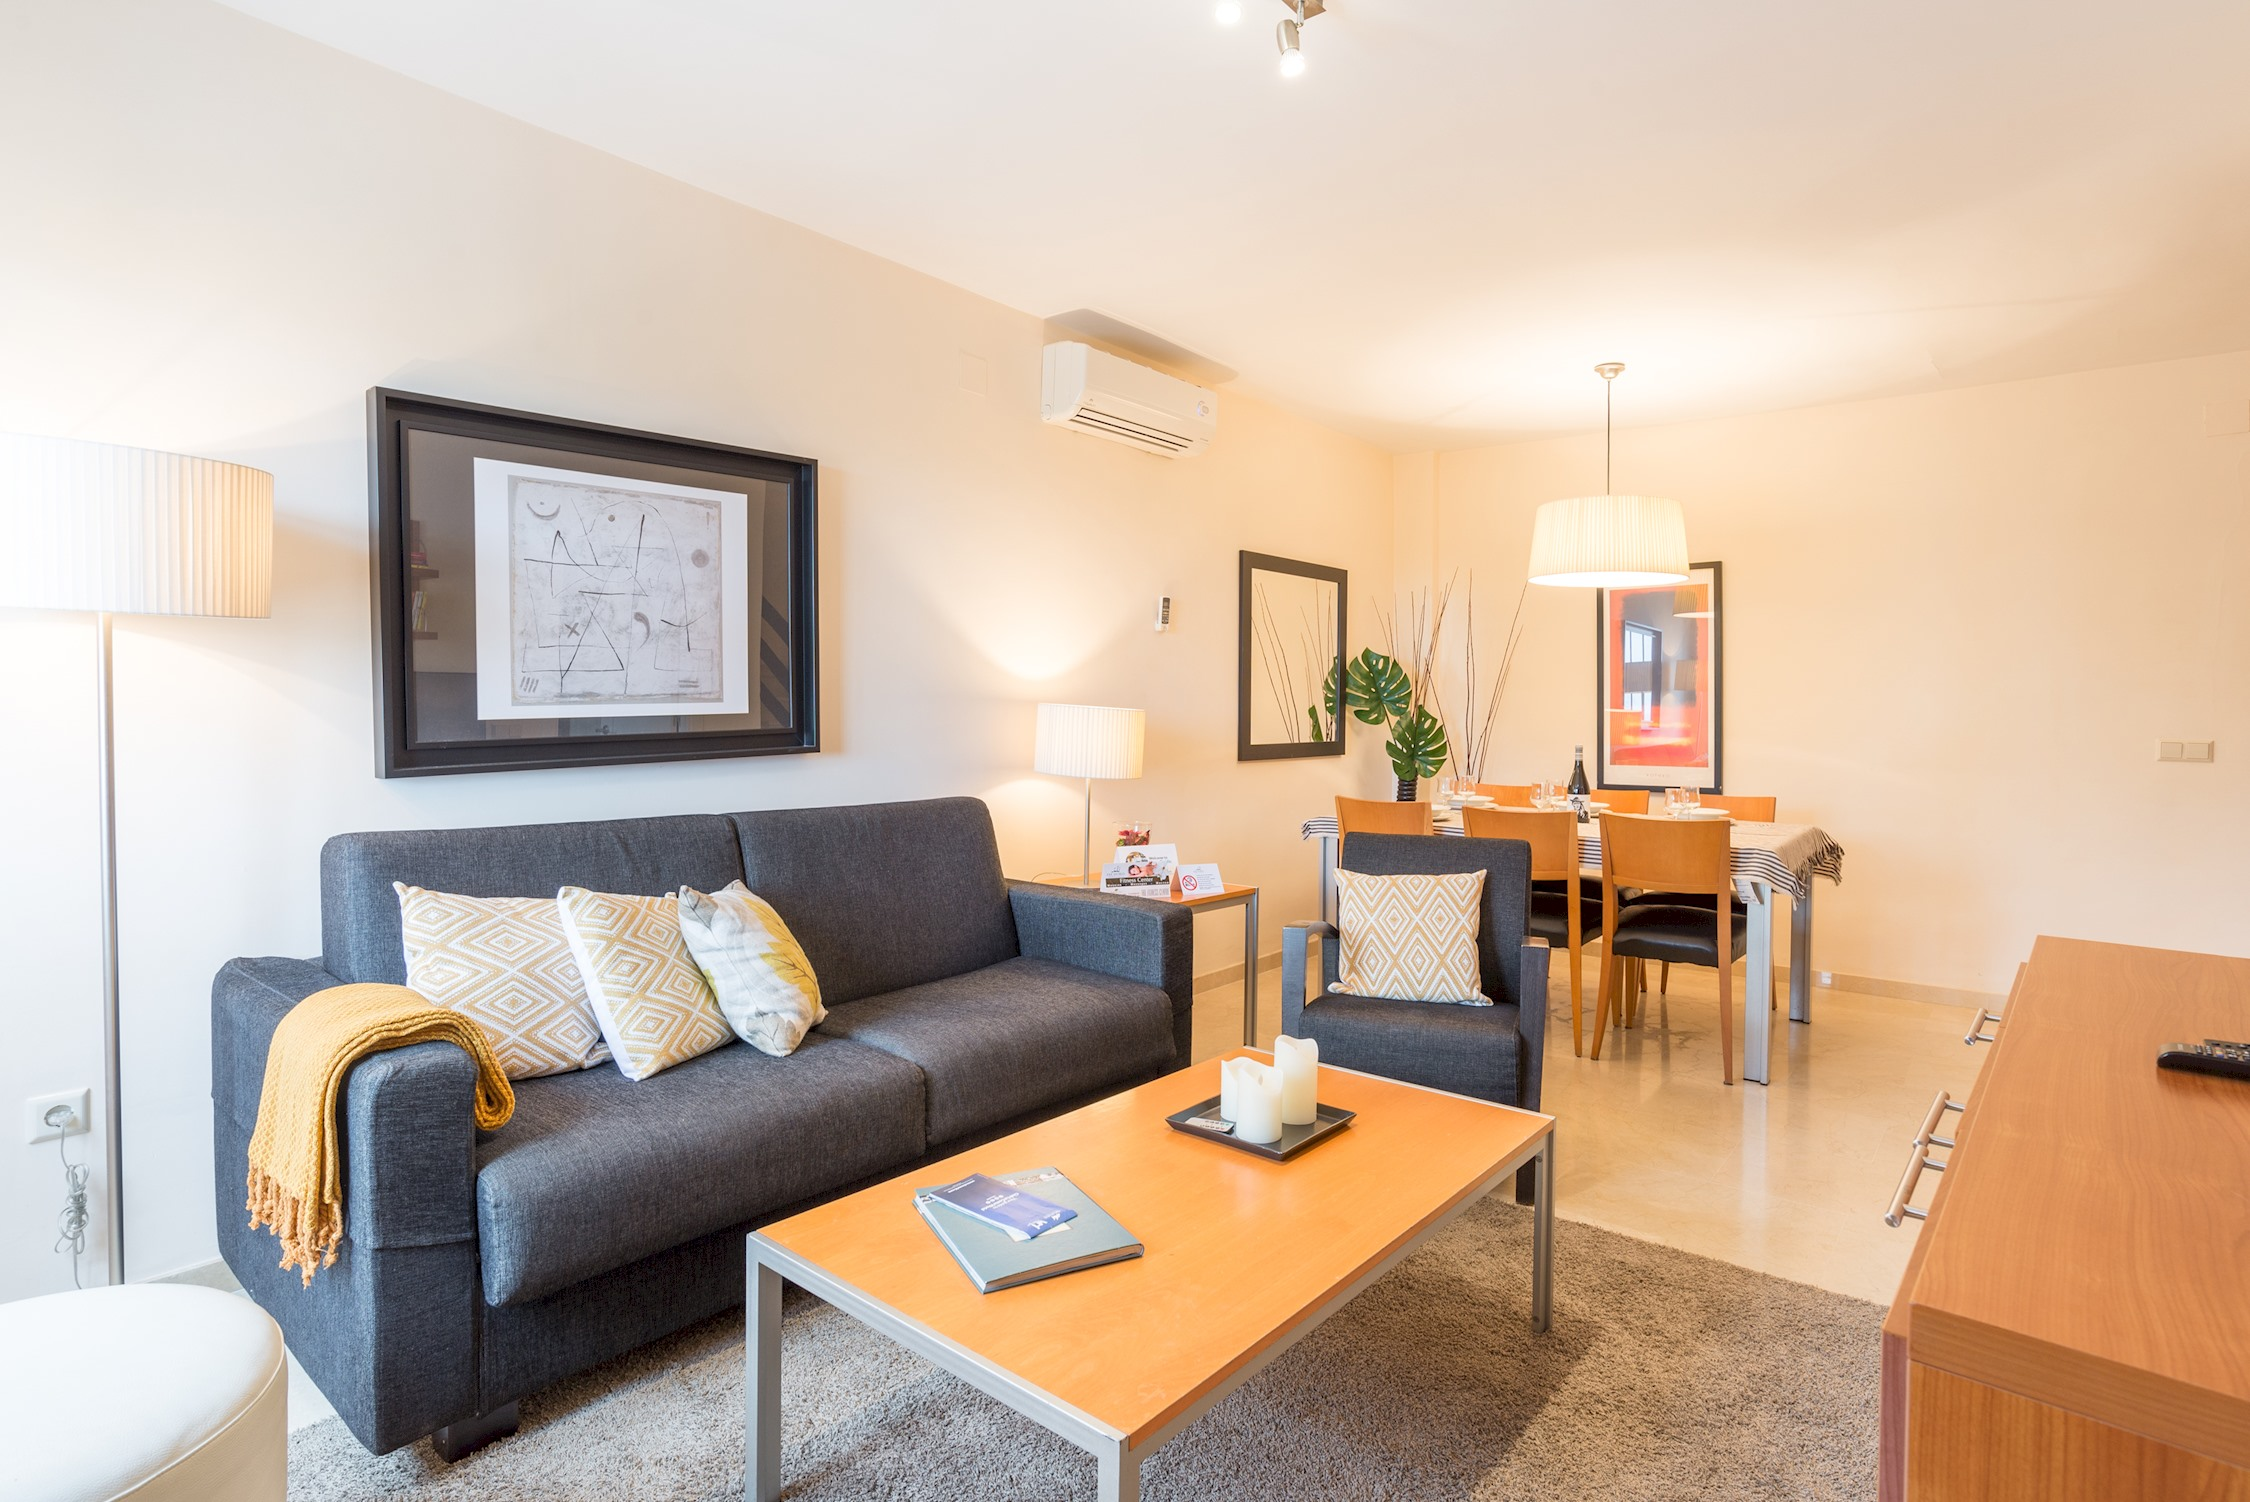 Apartment MalagaSuite Luxury   Relax photo 16676273